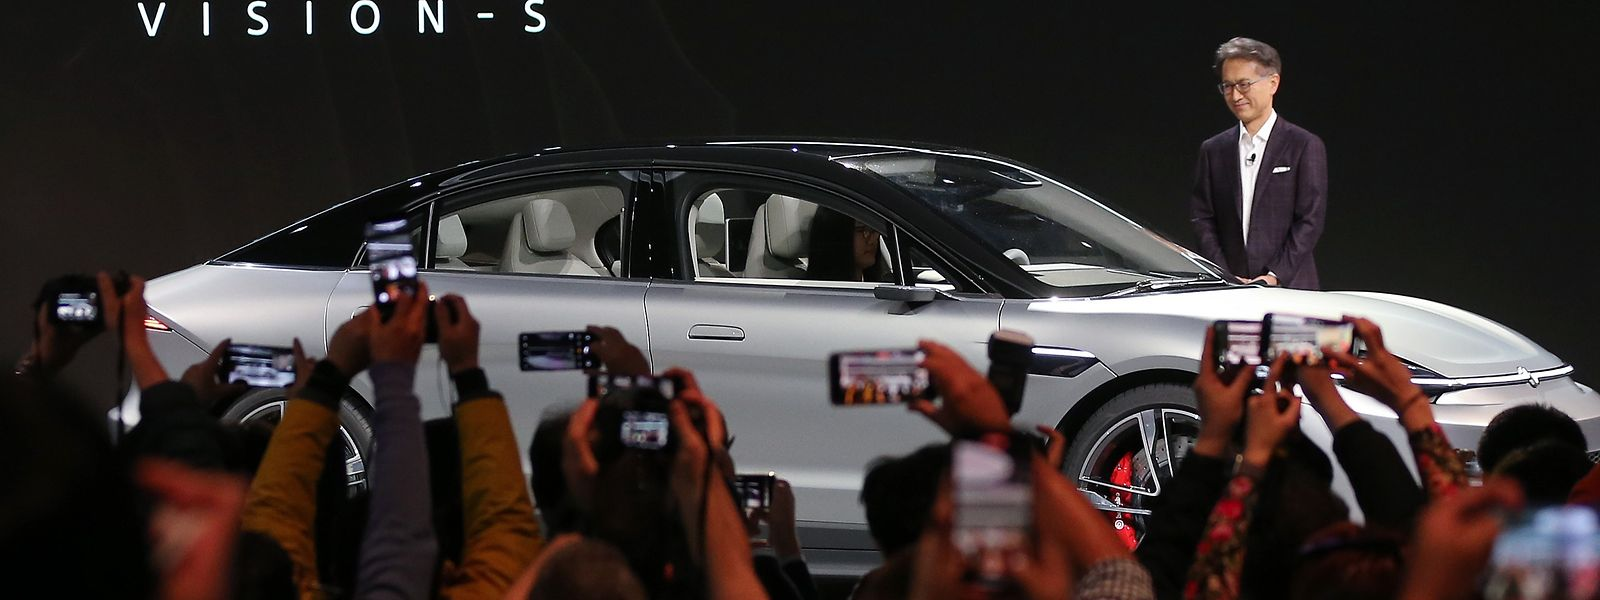 Sony-CEO Kenichiro Yoshida mit dem Sony Vision-S Konzeptfahrzeug.